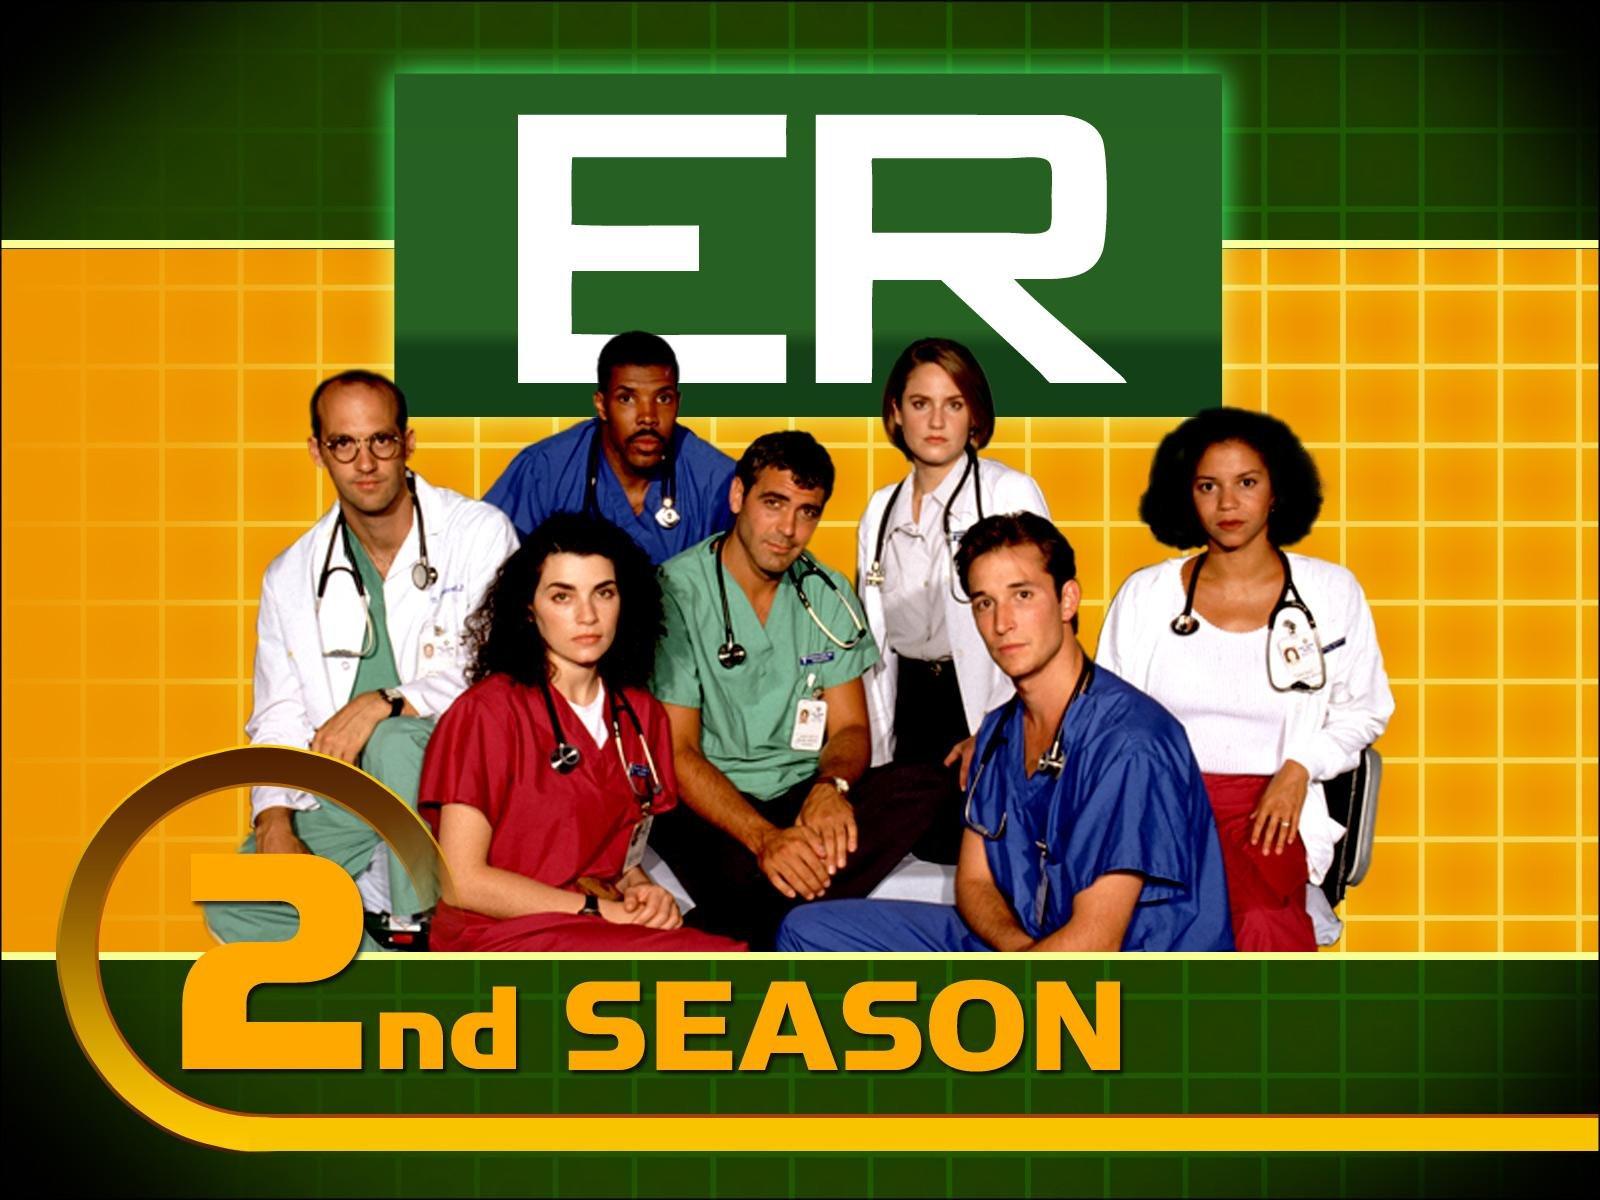 er season 15 episode 9 watch online